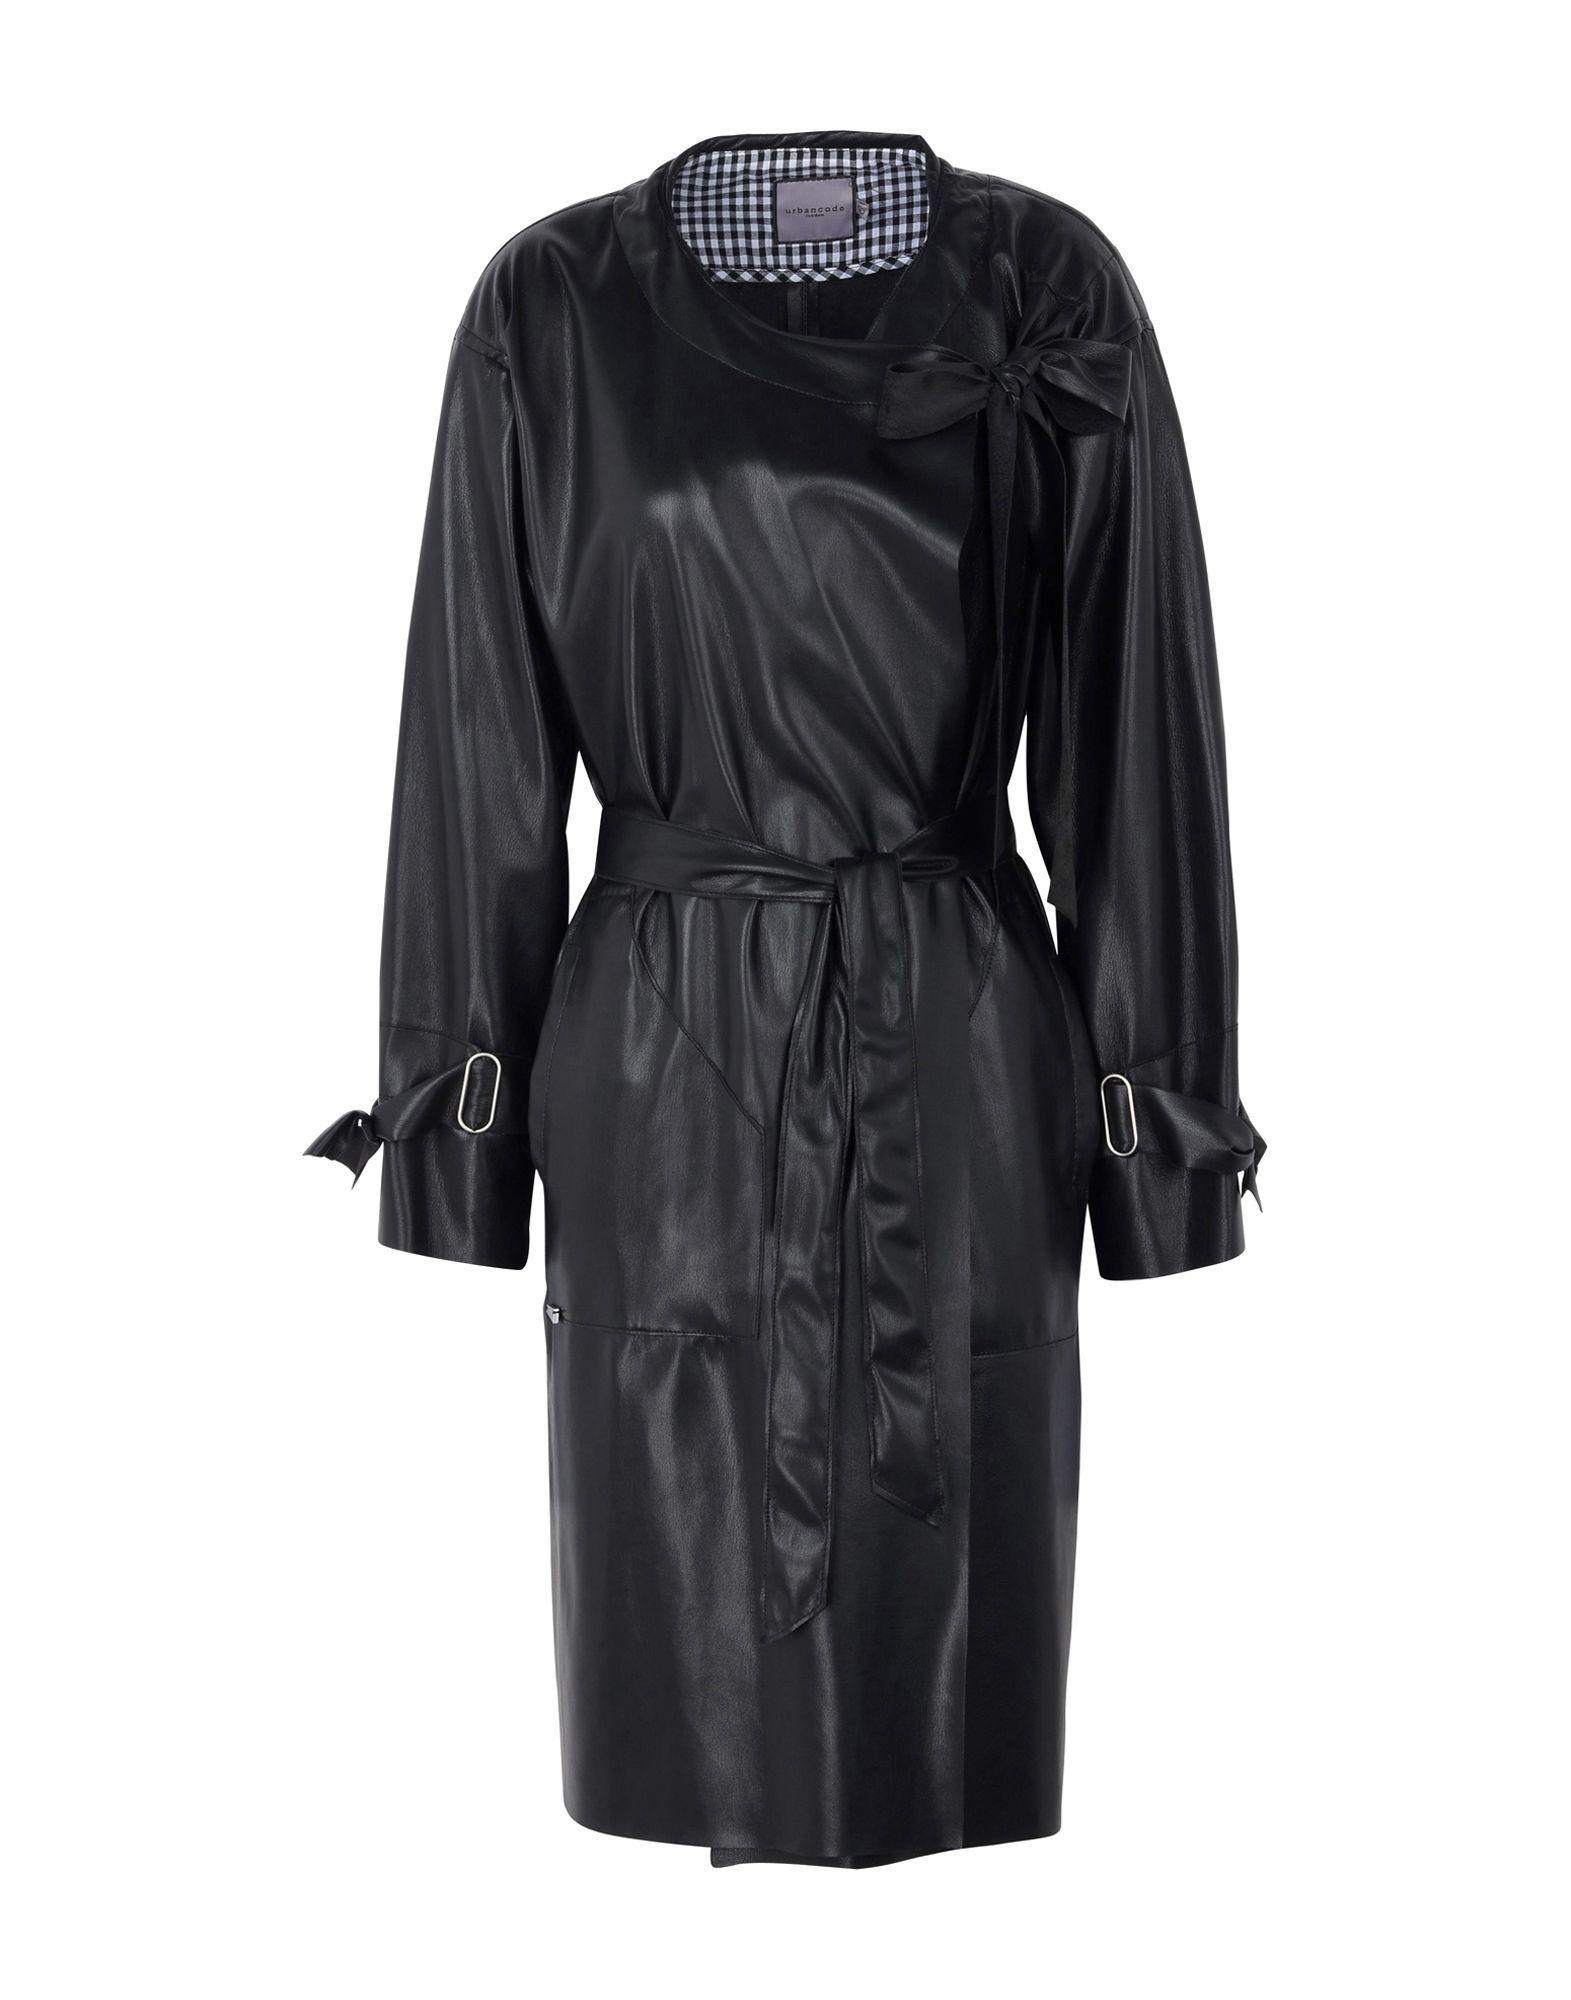 URBANCODE Overcoats in Black